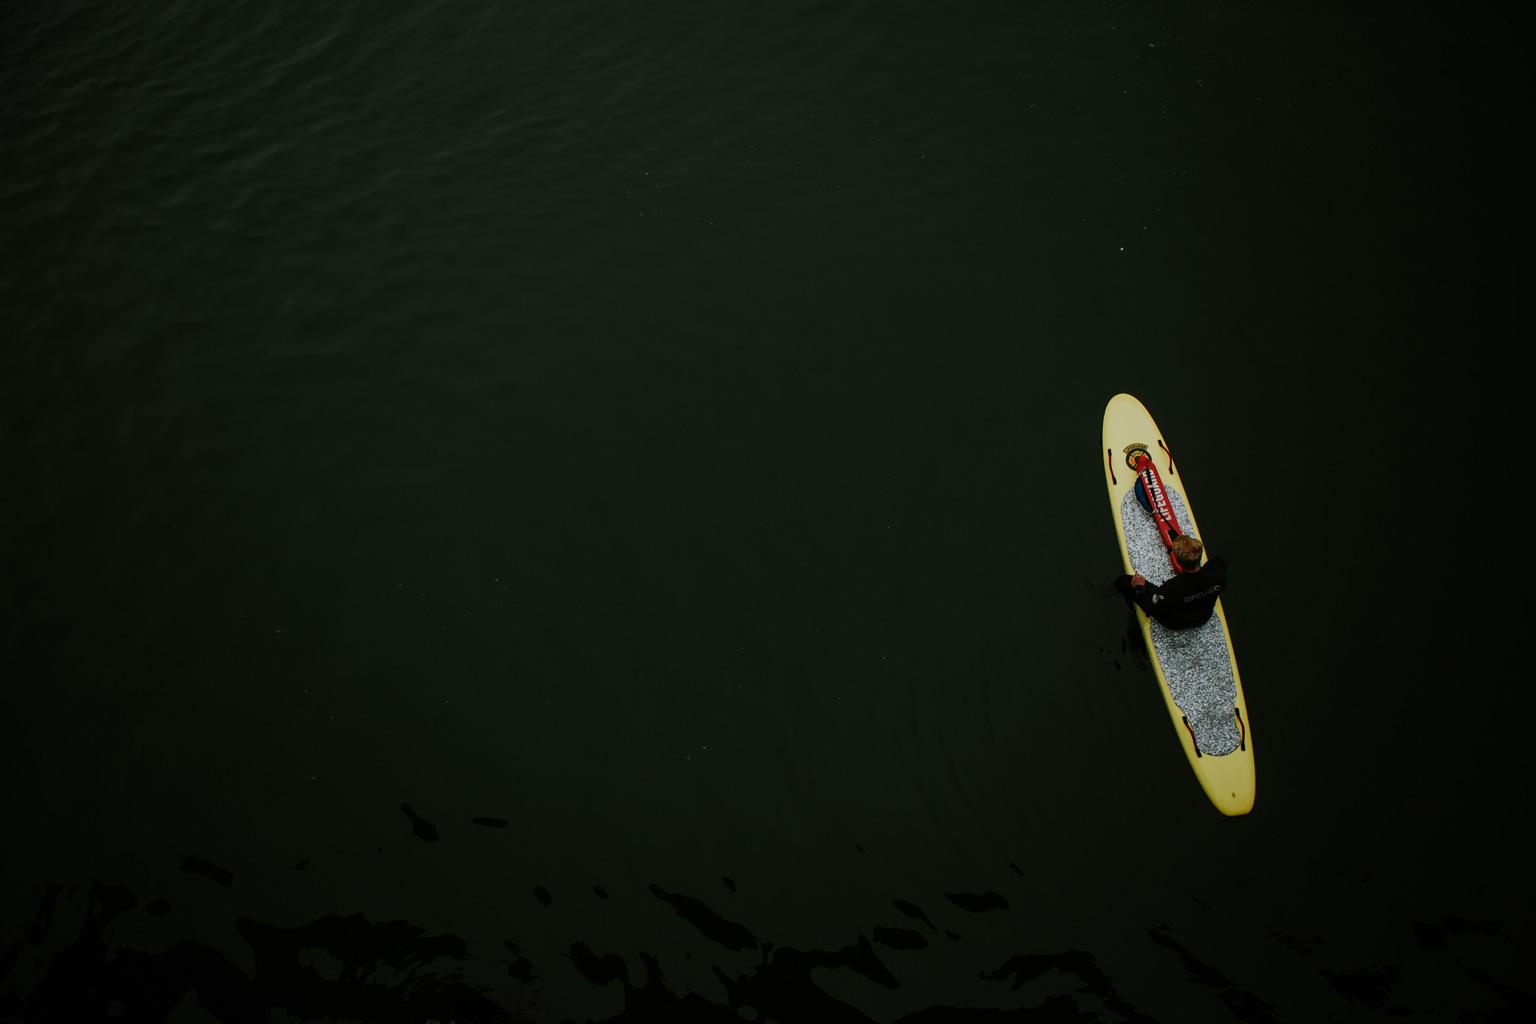 CindyGiovagnoli_SantCruz_SanJose_SanFrancisco_NelderGrove_sea_lions_boardwalk_hapas_brewery_sourdough_ocean_half_moon_bay_California-051.jpg